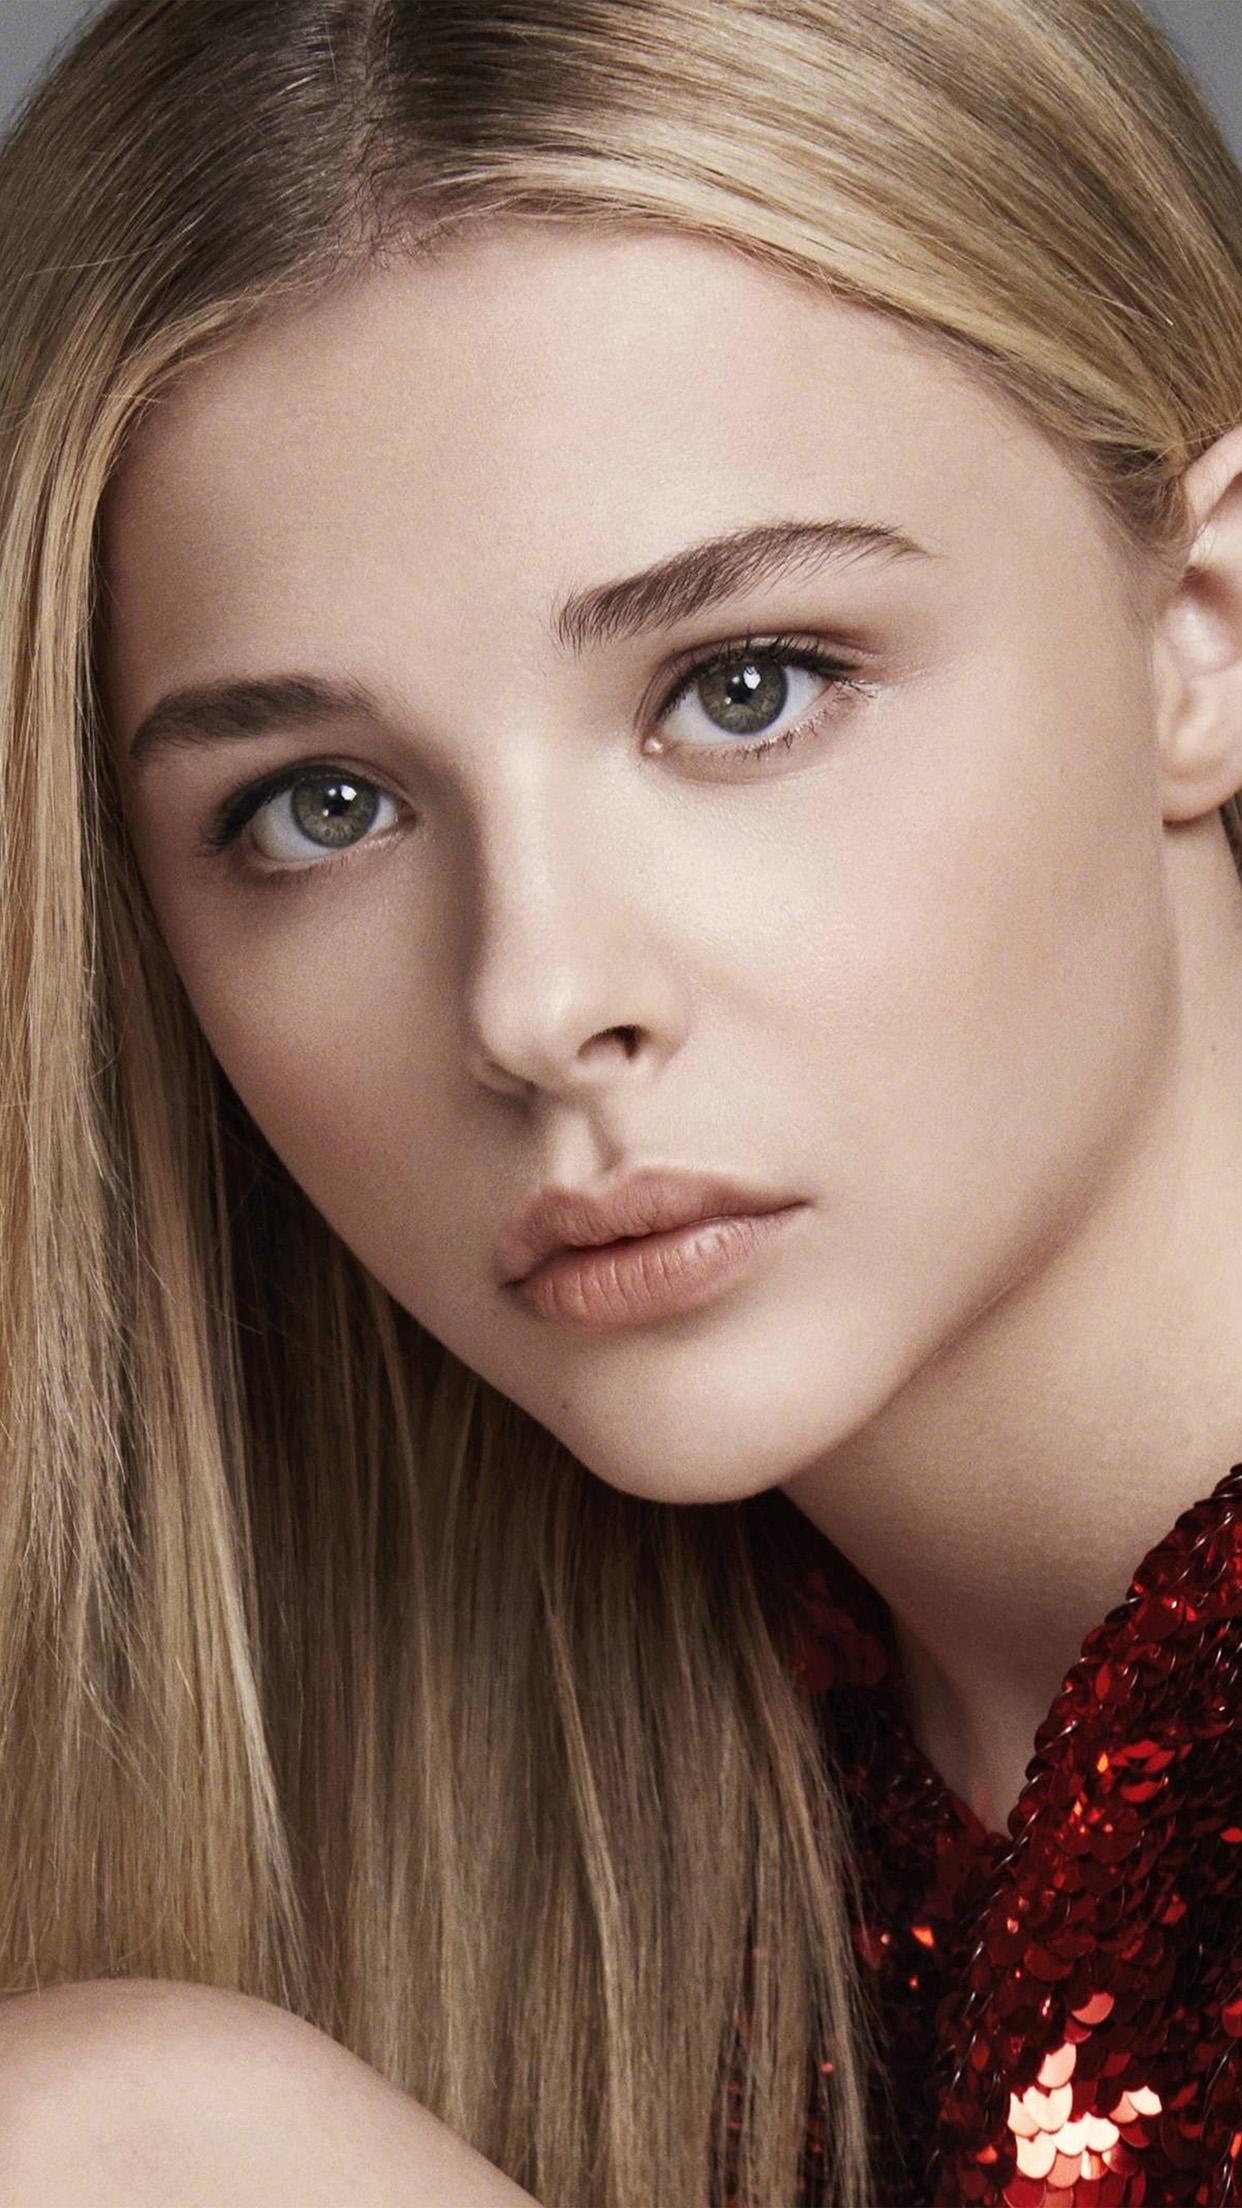 | hq12-girl-actress-celebrity-chloe-grace-moretz